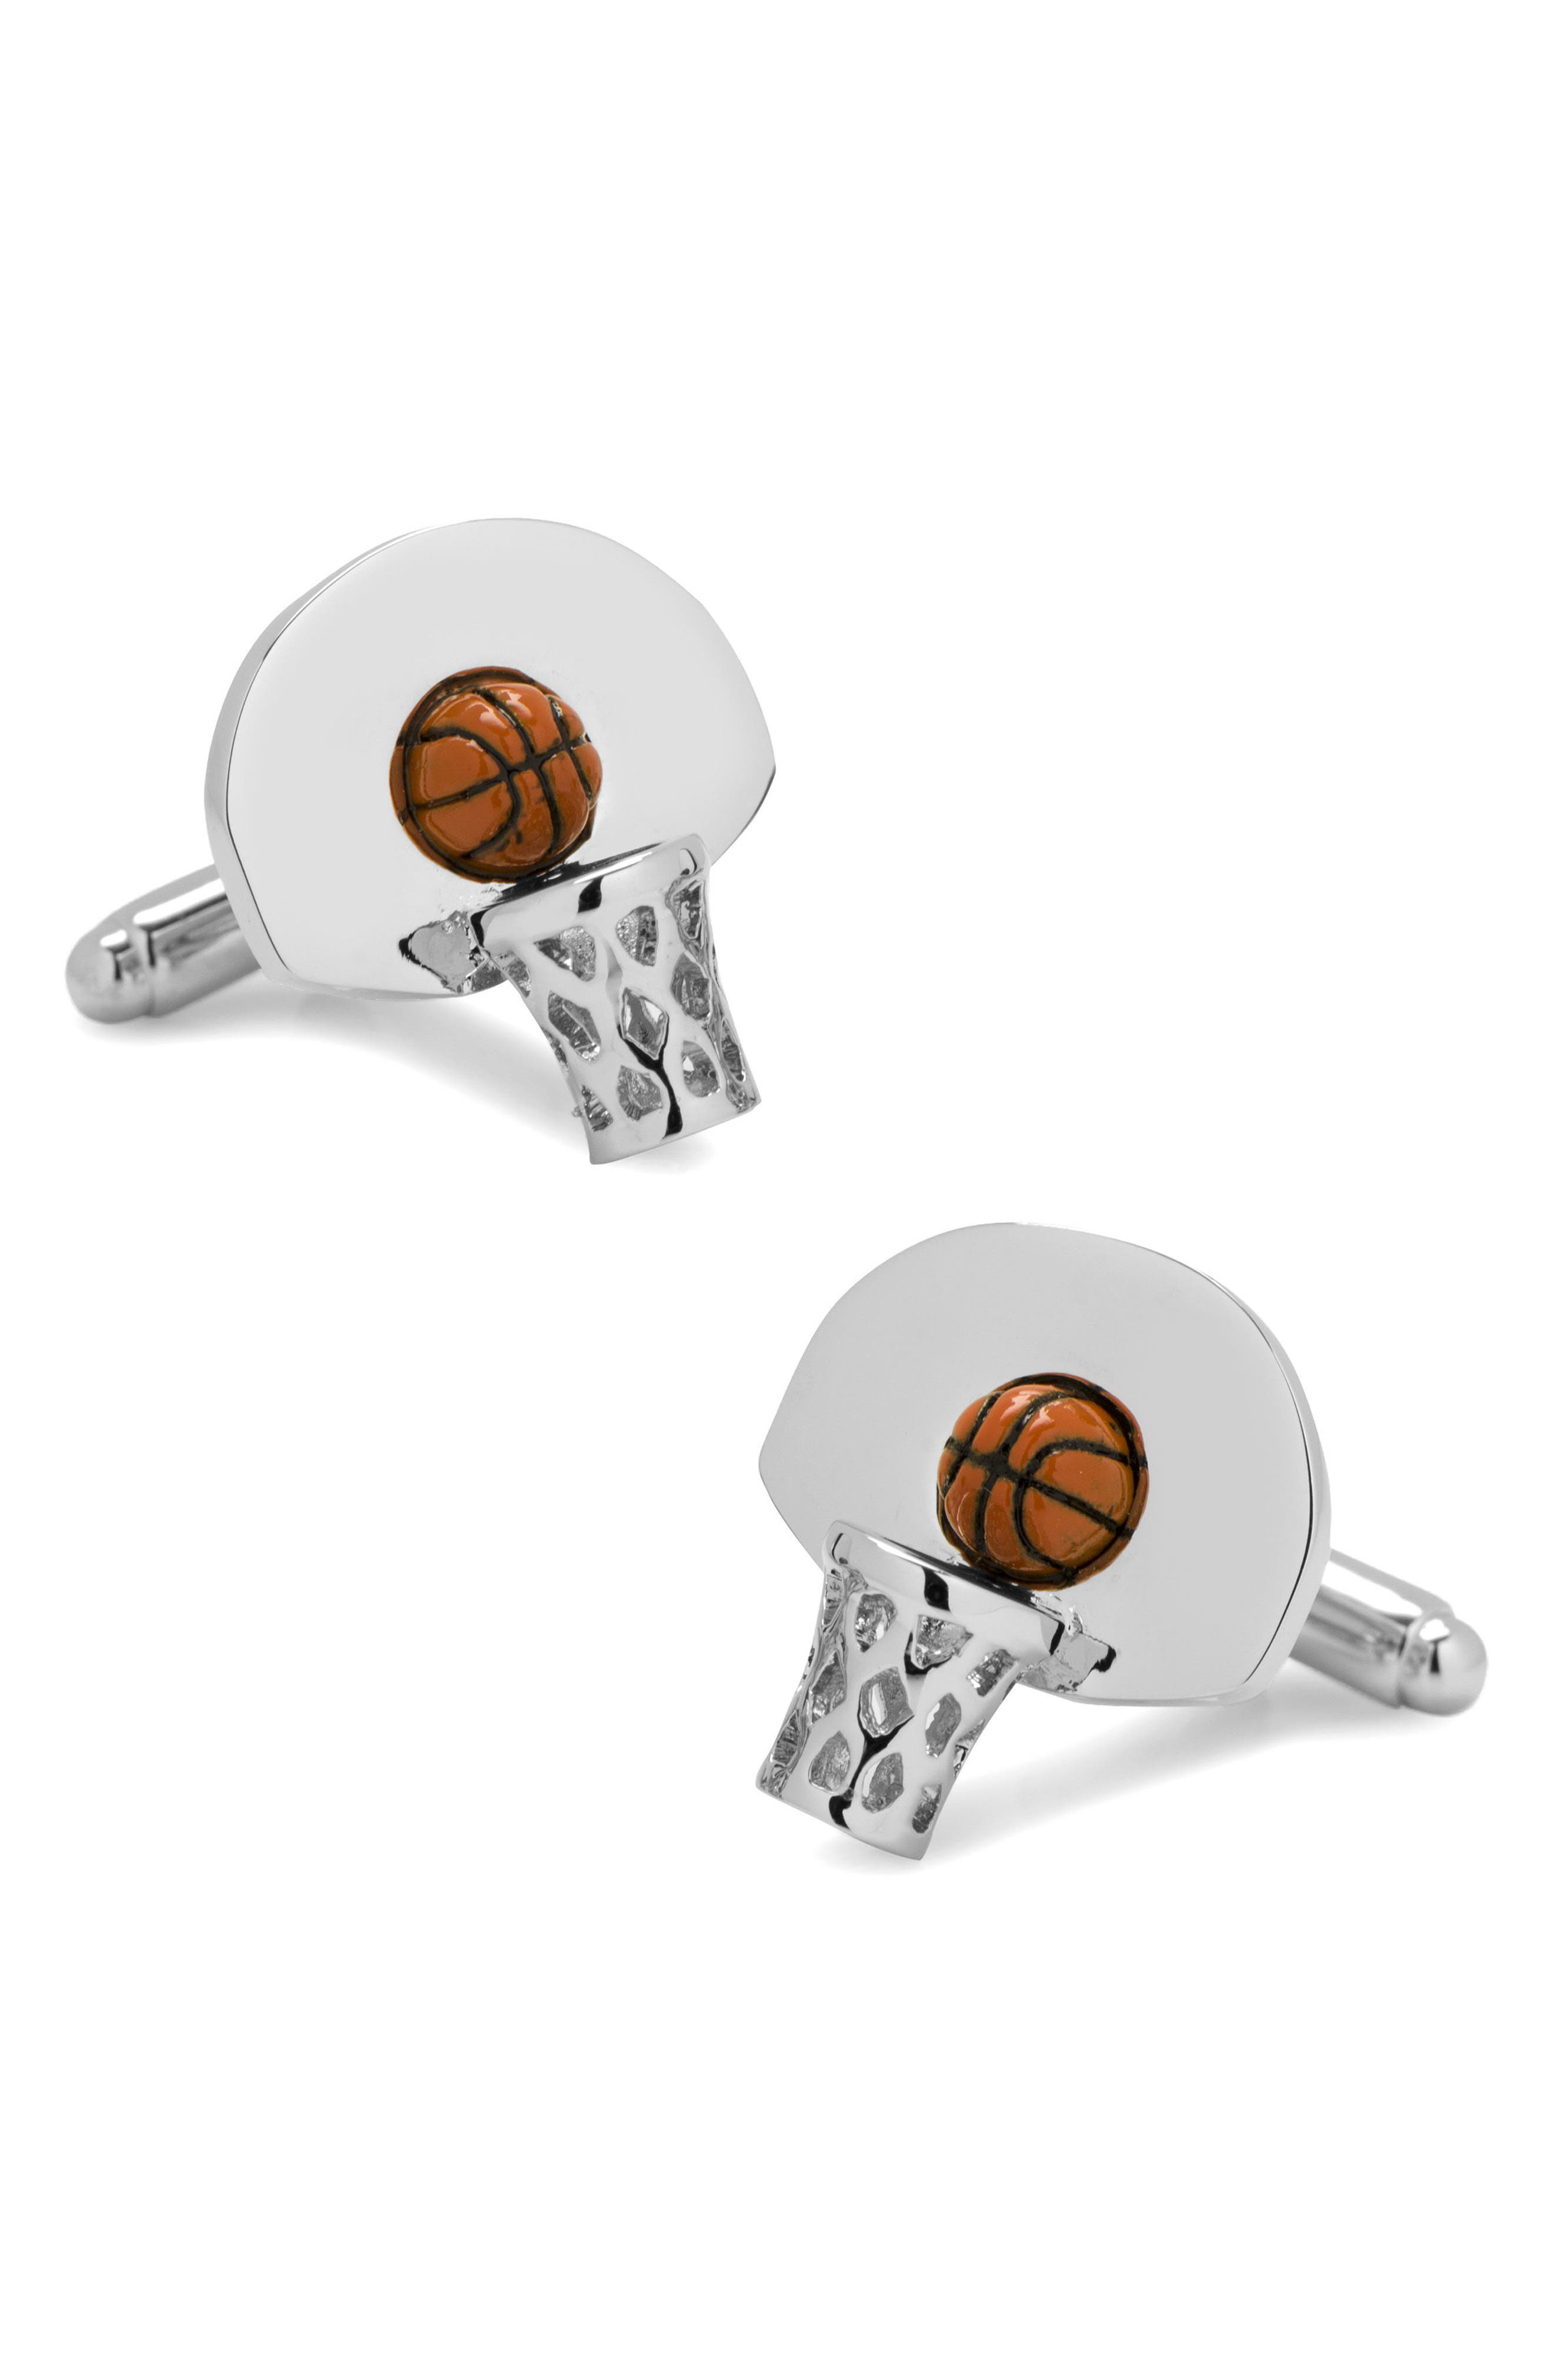 Basketball Hoop Cuff Links,                             Main thumbnail 1, color,                             040